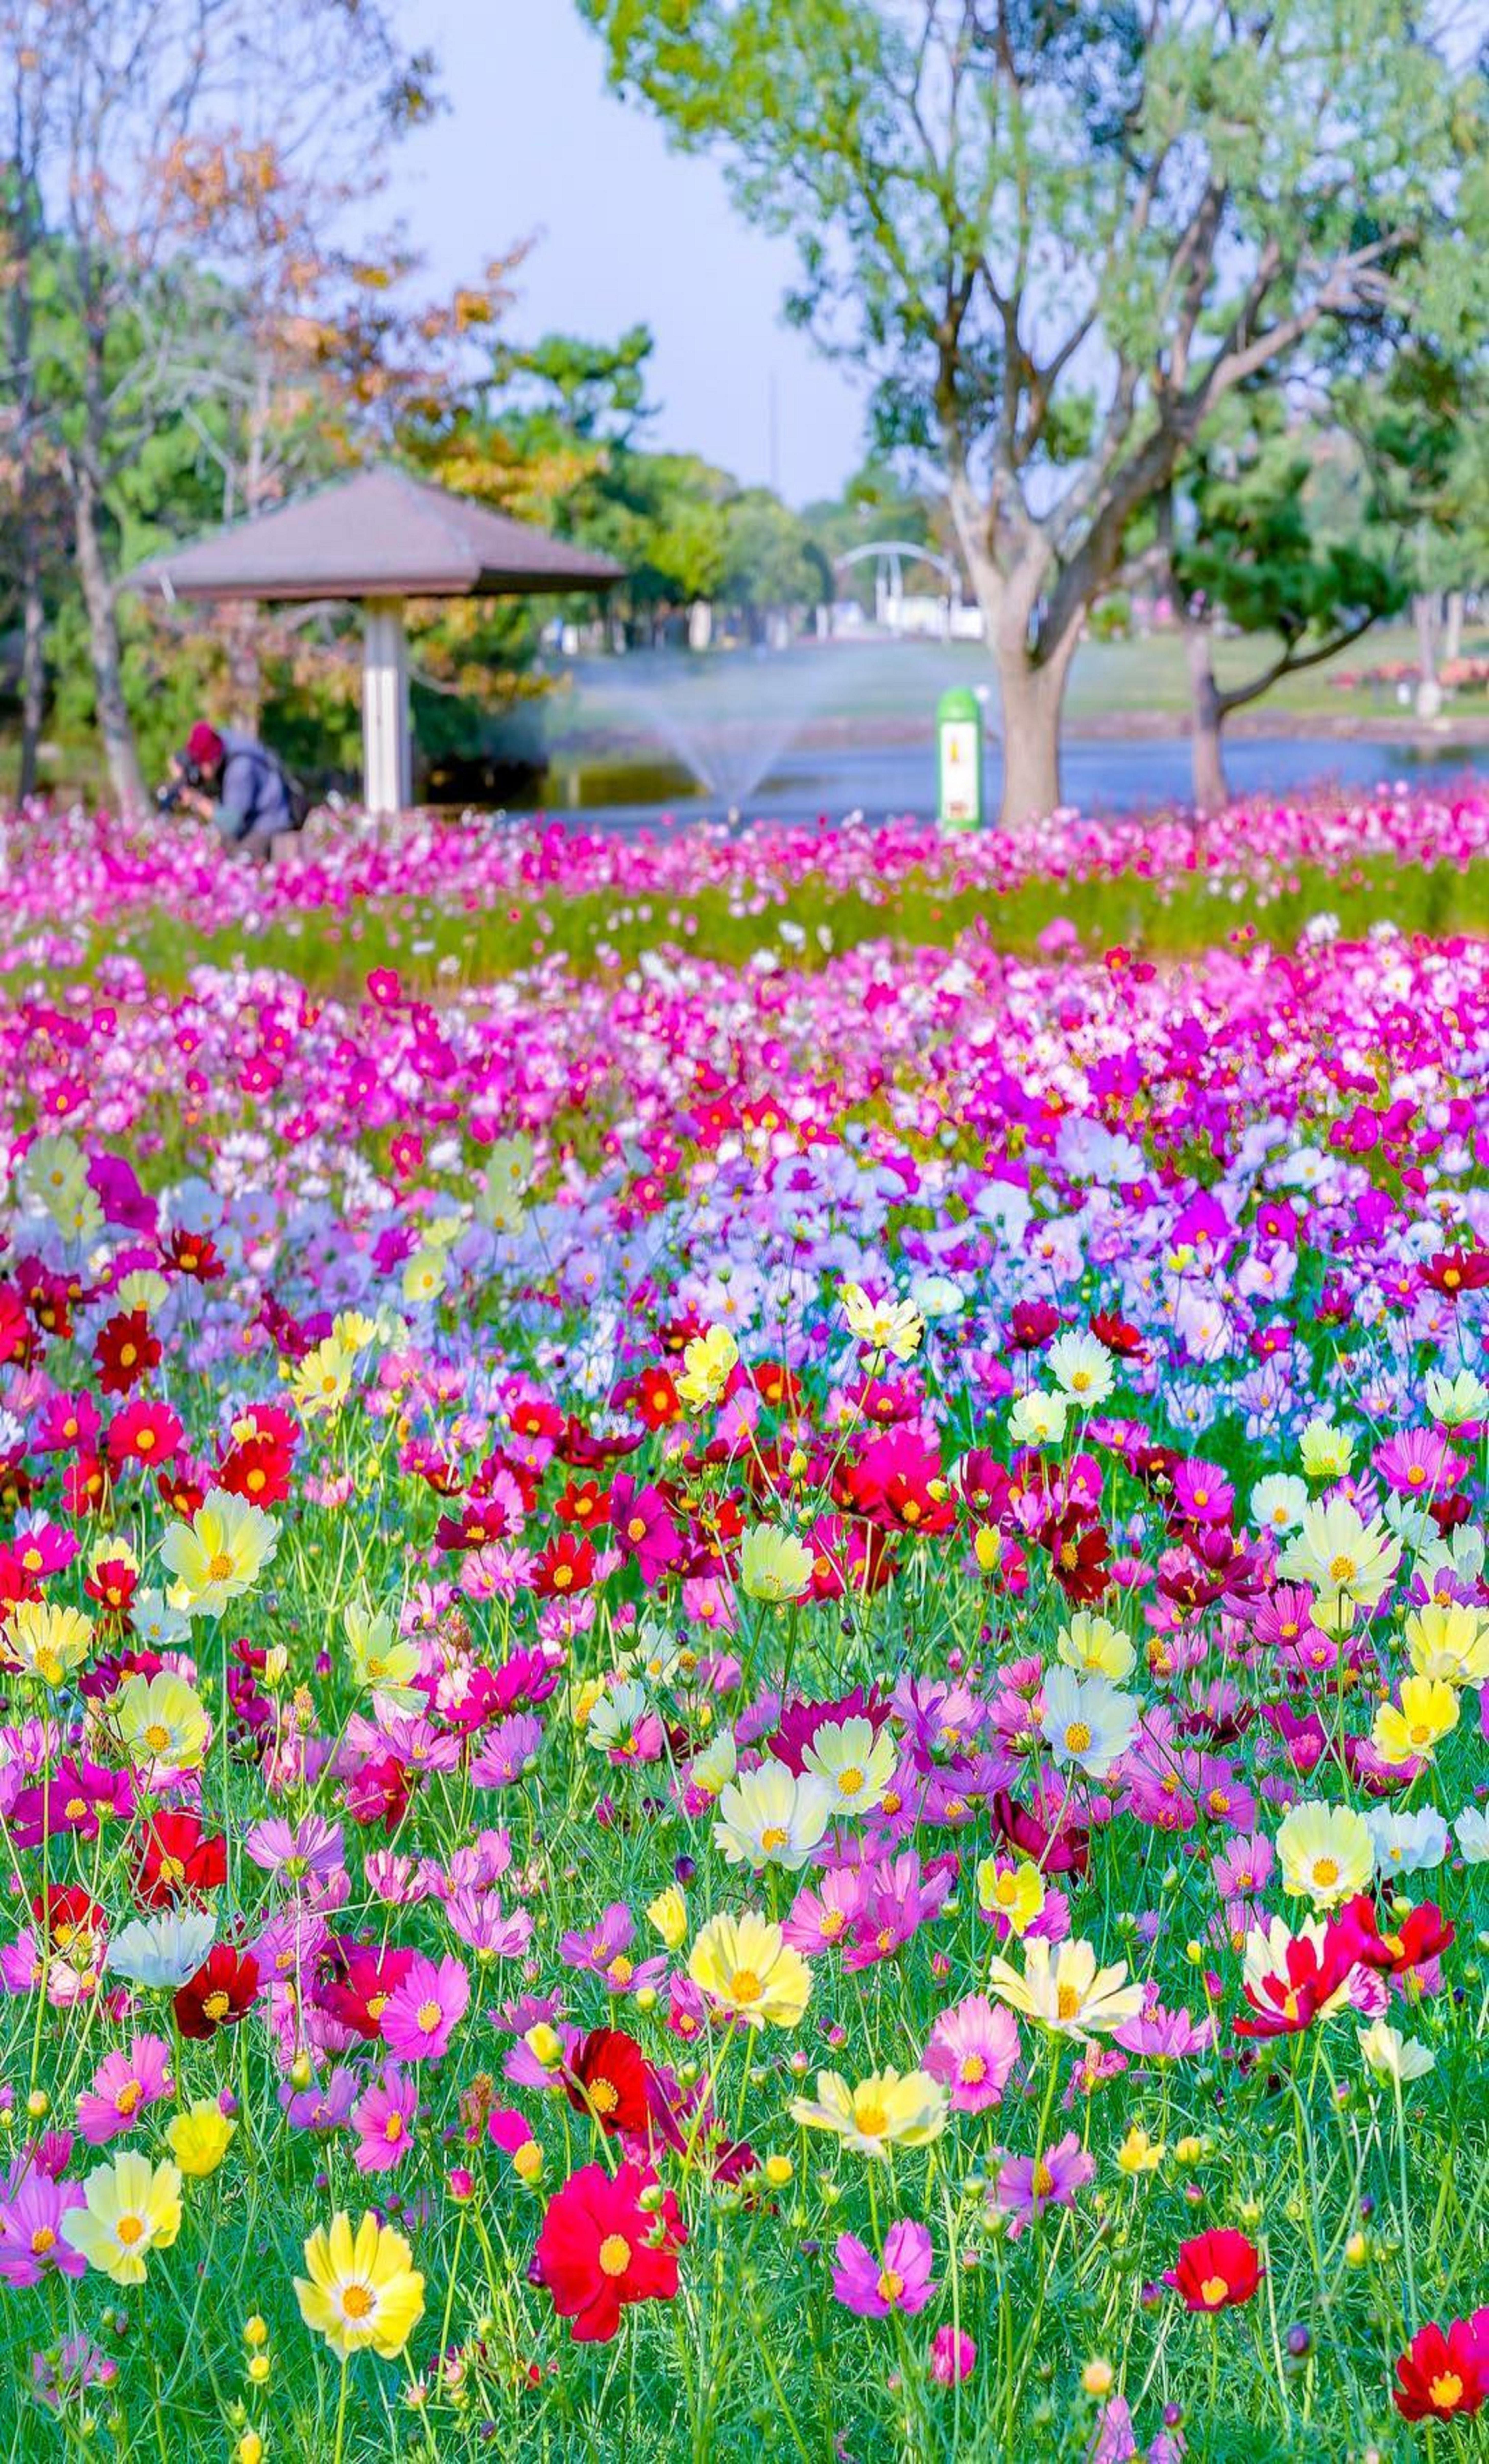 Flower Scenery Wallpapers Top Free Flower Scenery Backgrounds Wallpaperaccess